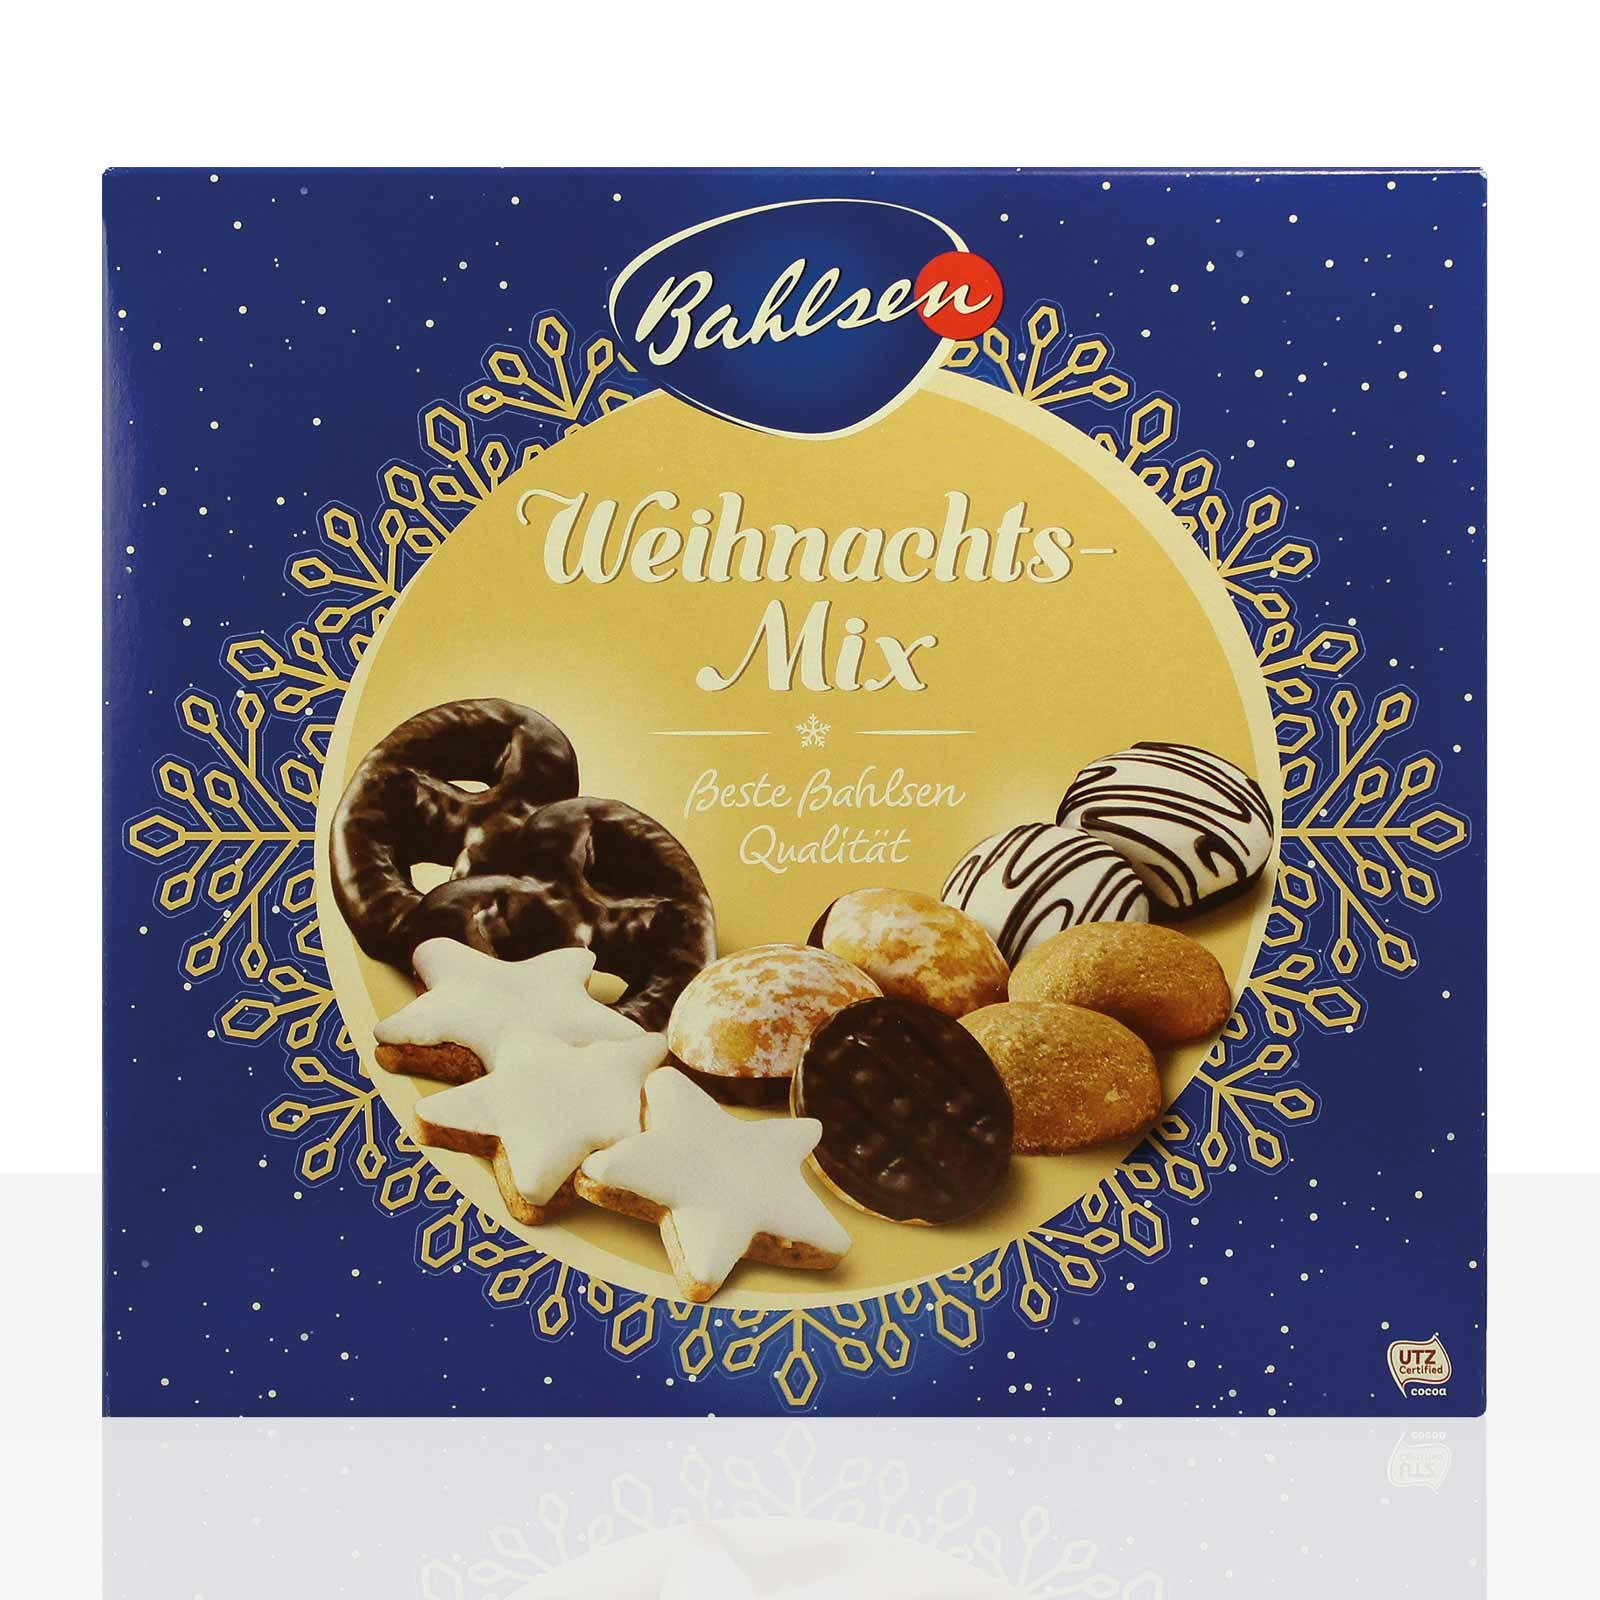 Bahlsen Weihnachts-Mix Lebkuchen 2 x 500g